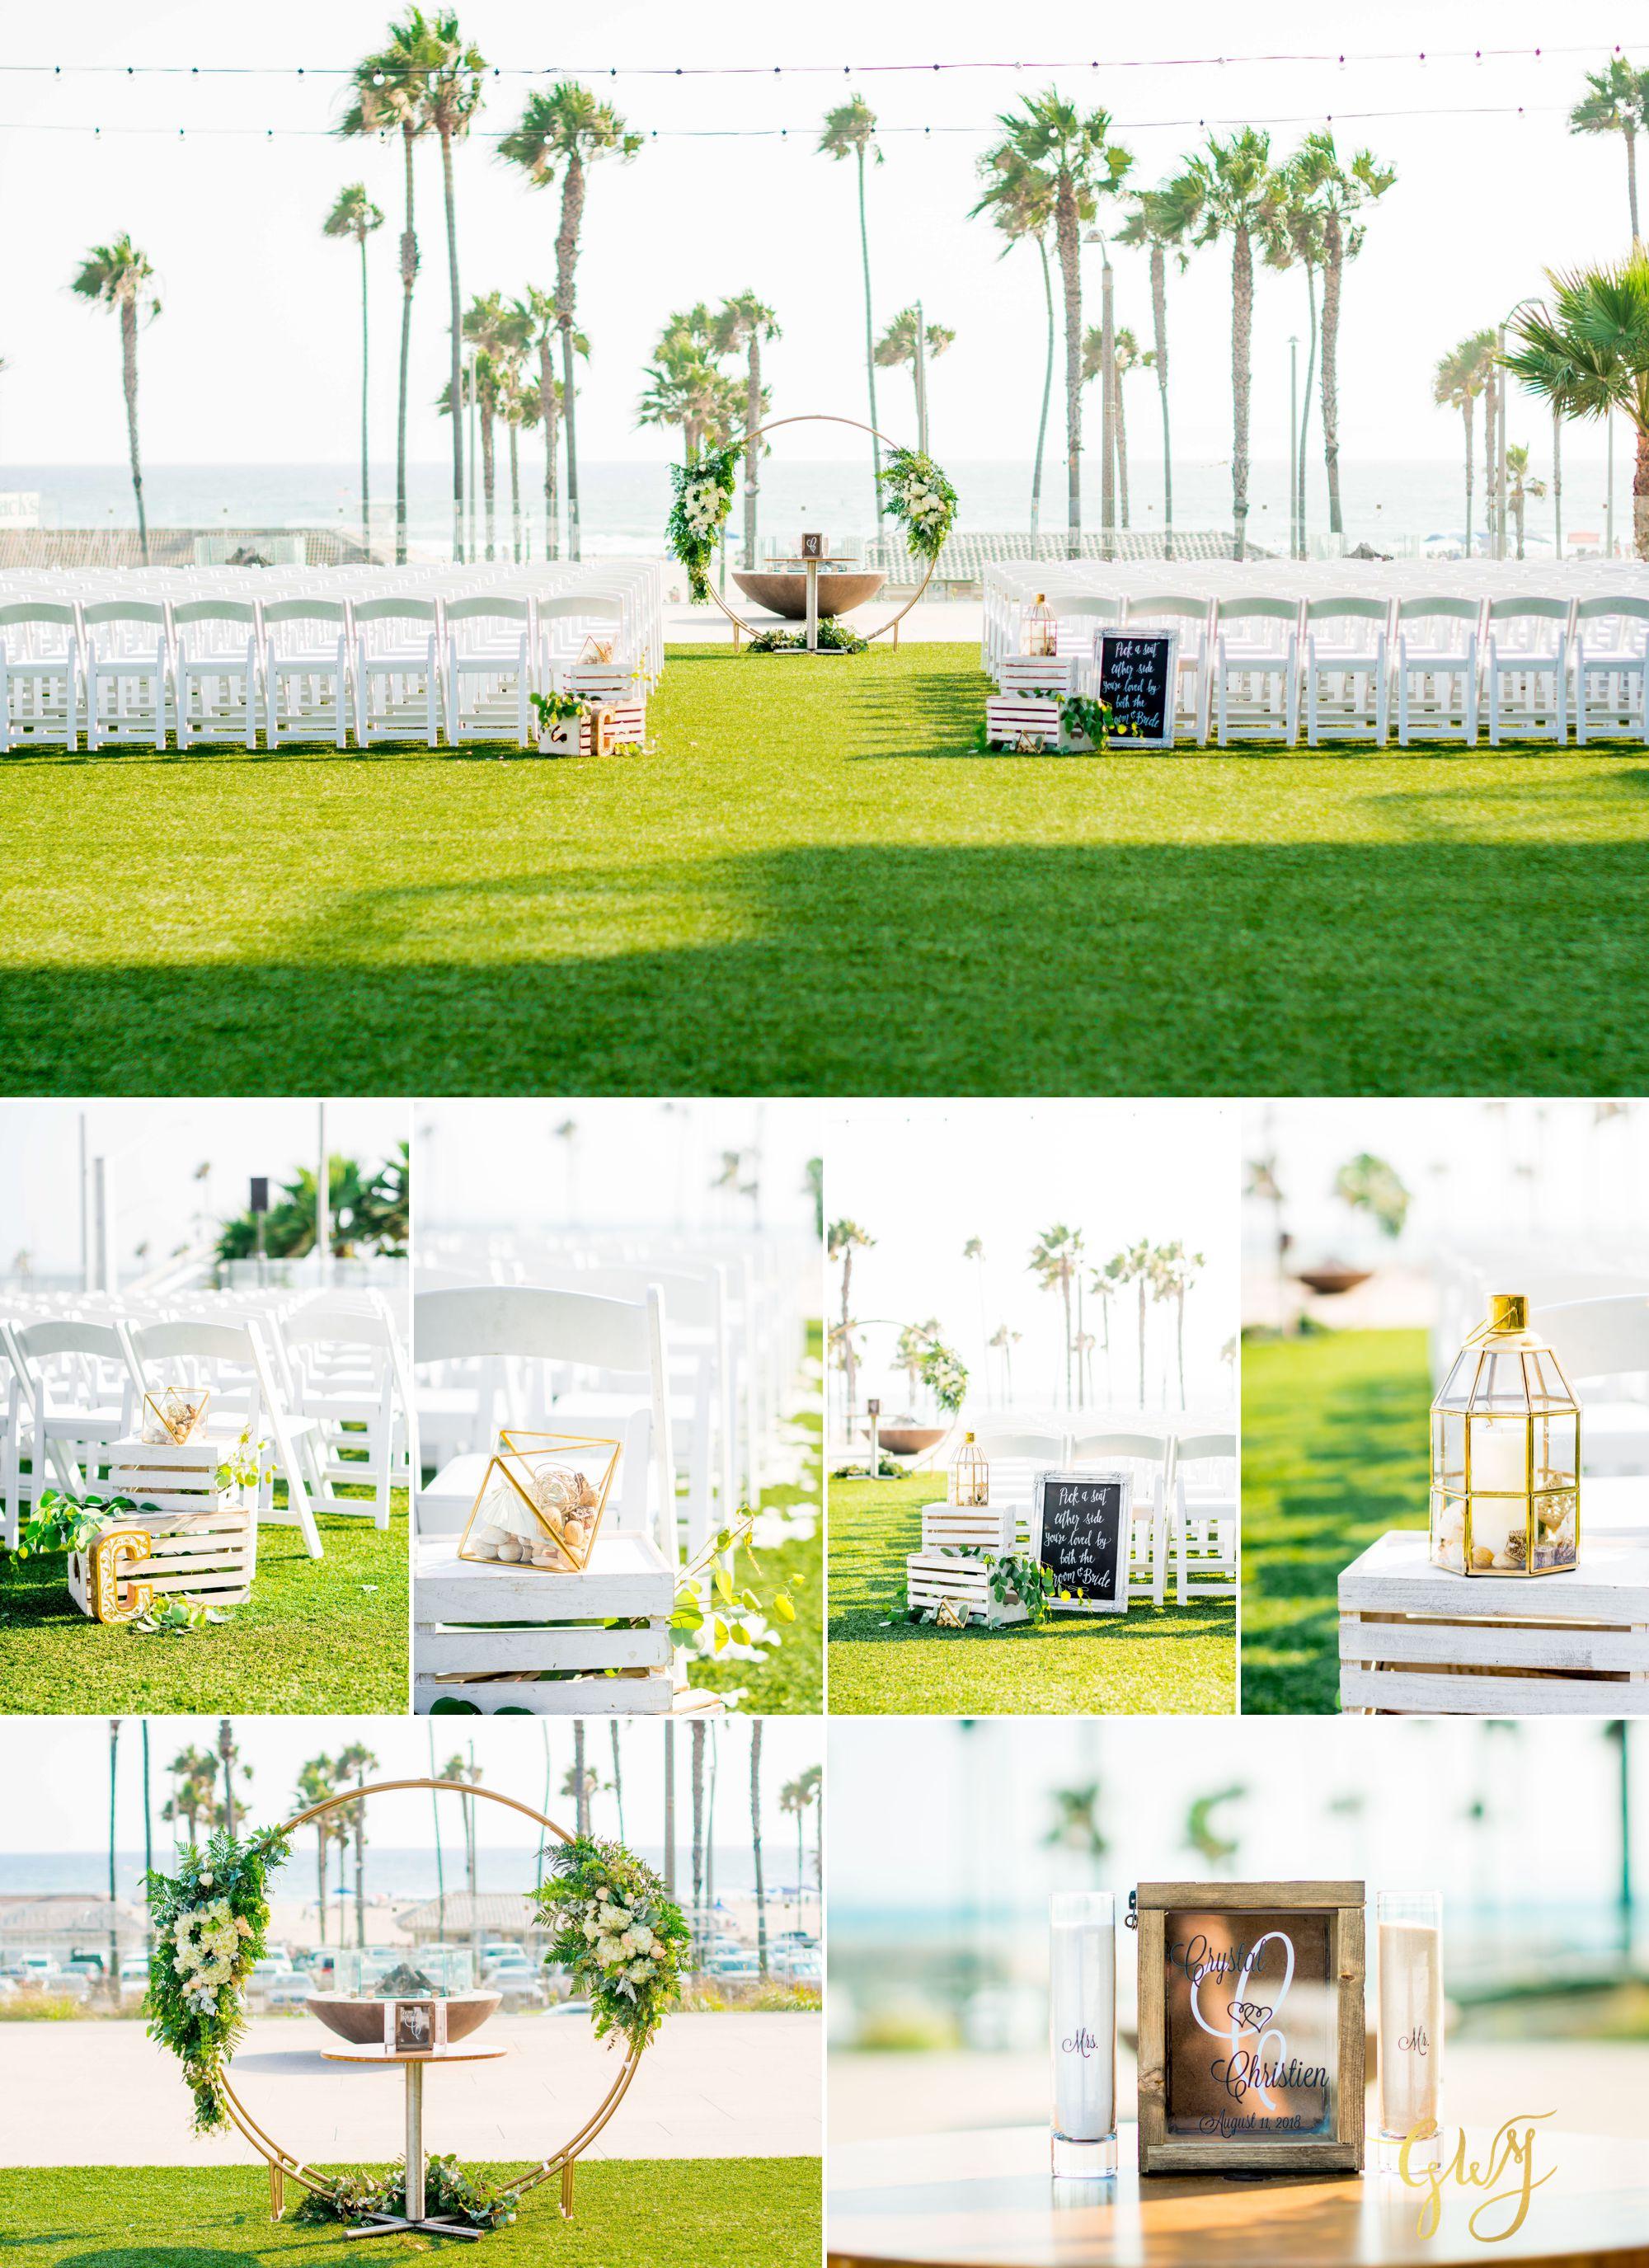 Christien + Crystal Pasea Hotel & Spa Huntington Beach Wedding by Glass Woods Media 37.jpg